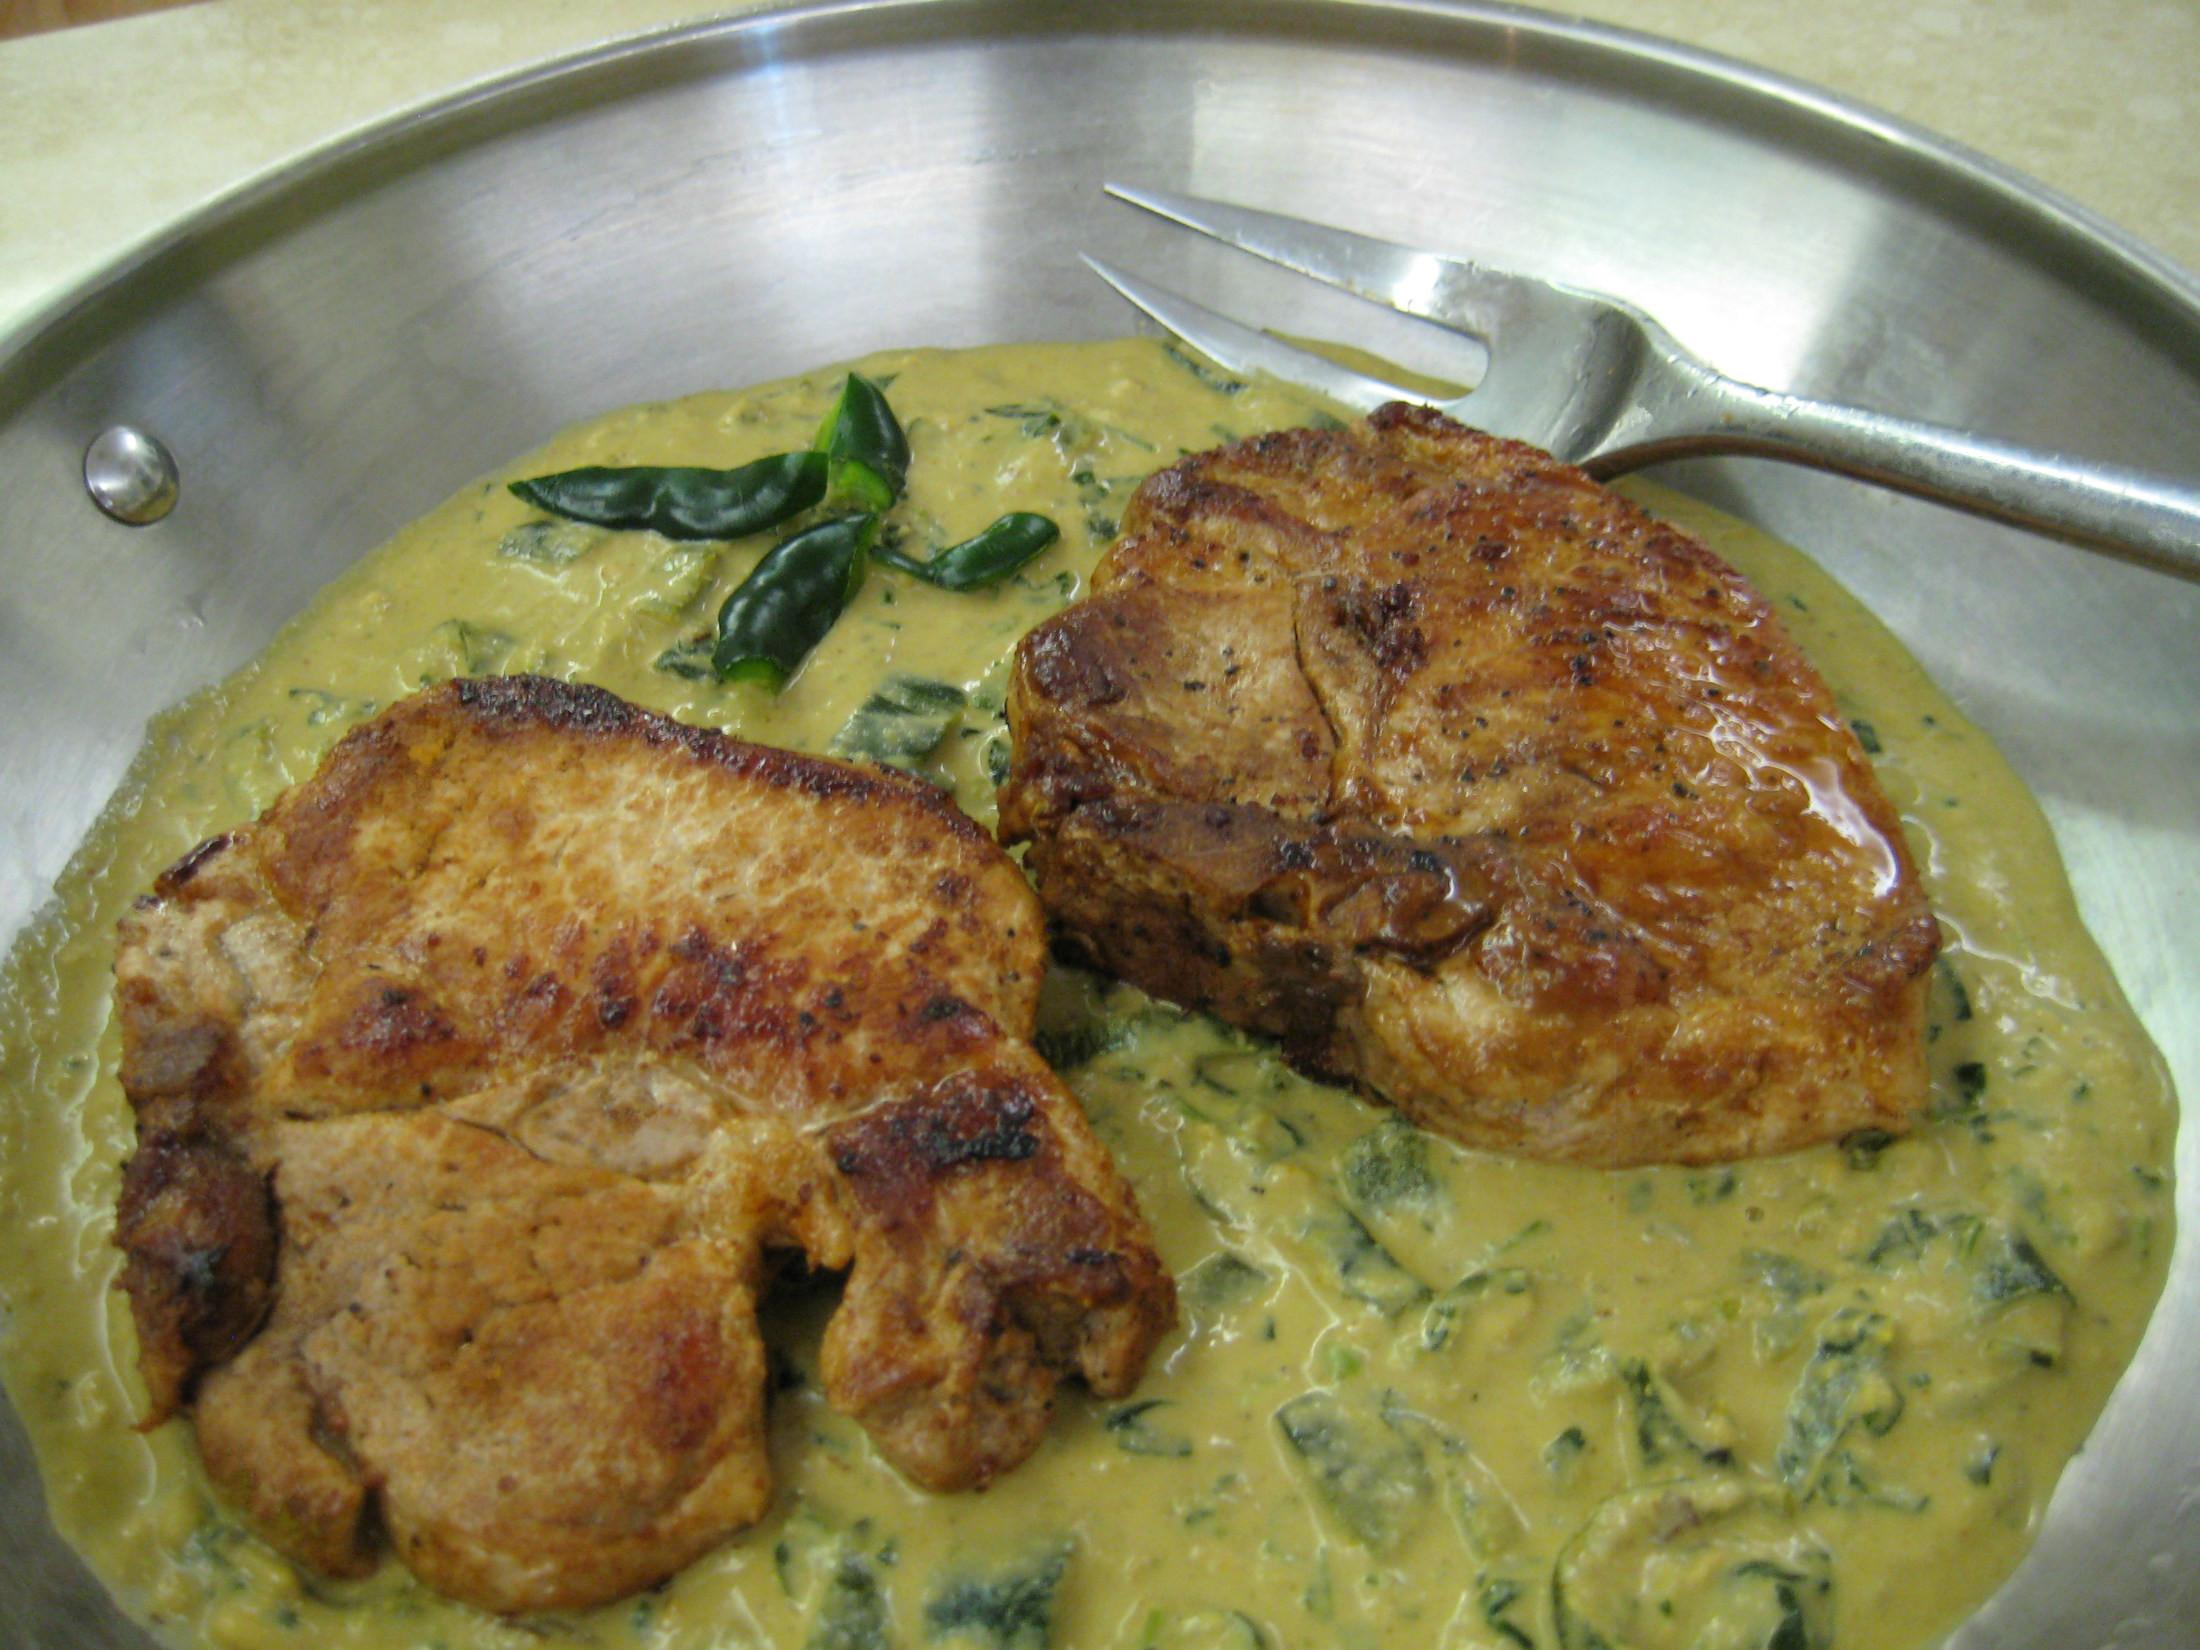 Carbs In Pork Chops  low carb baked pork chops